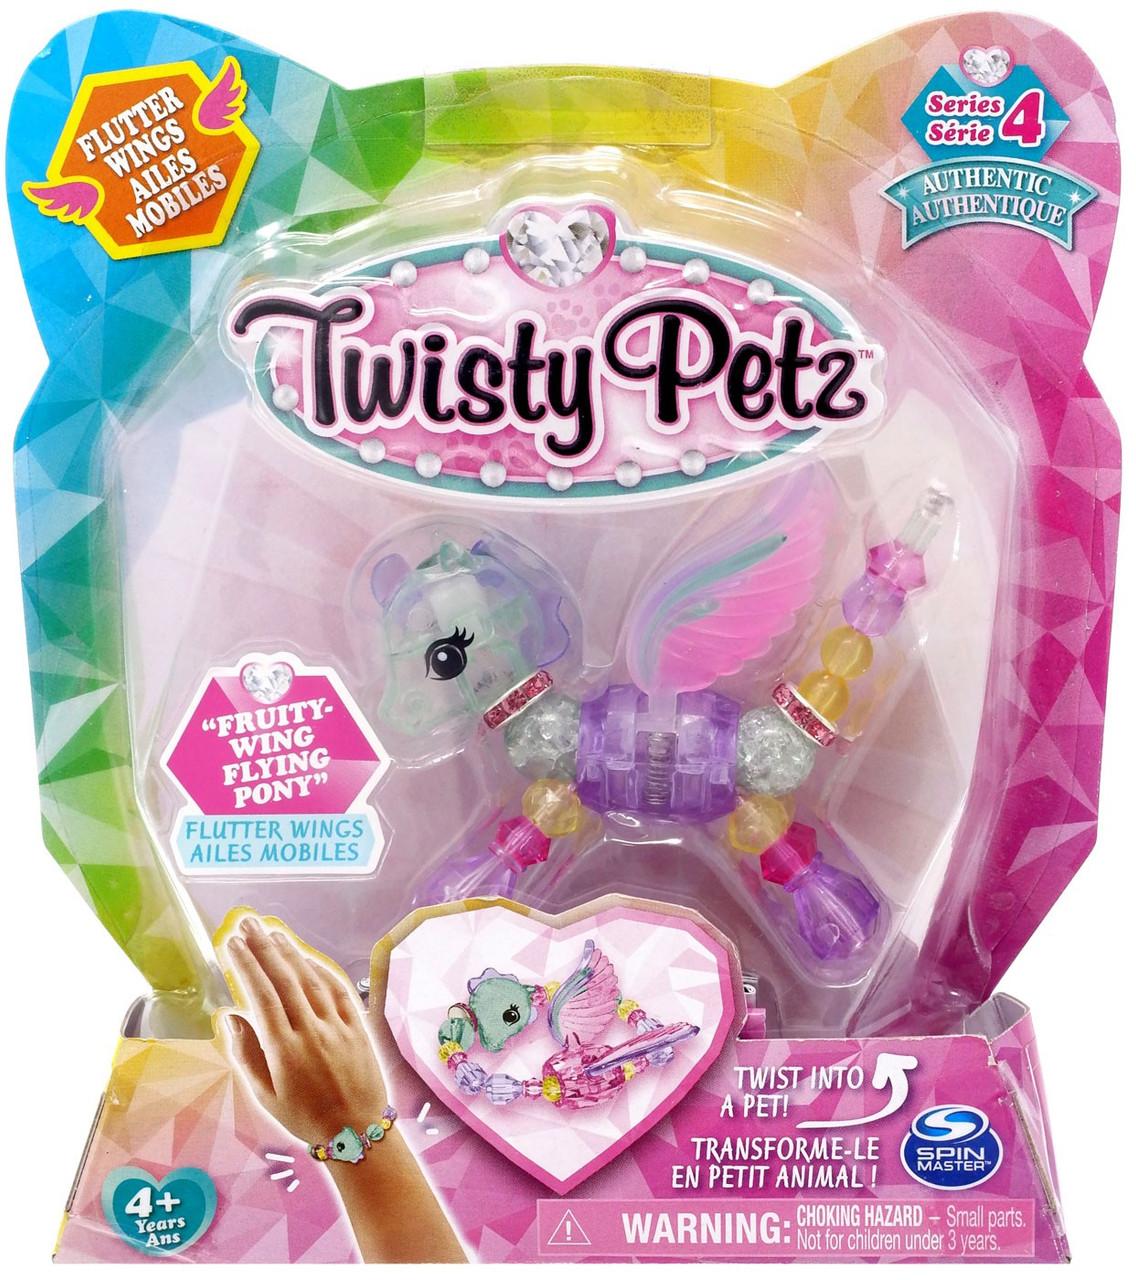 Fruity Wing Flying Pony* Twist Pet To Bracelet Twisty Petz SERIES 4